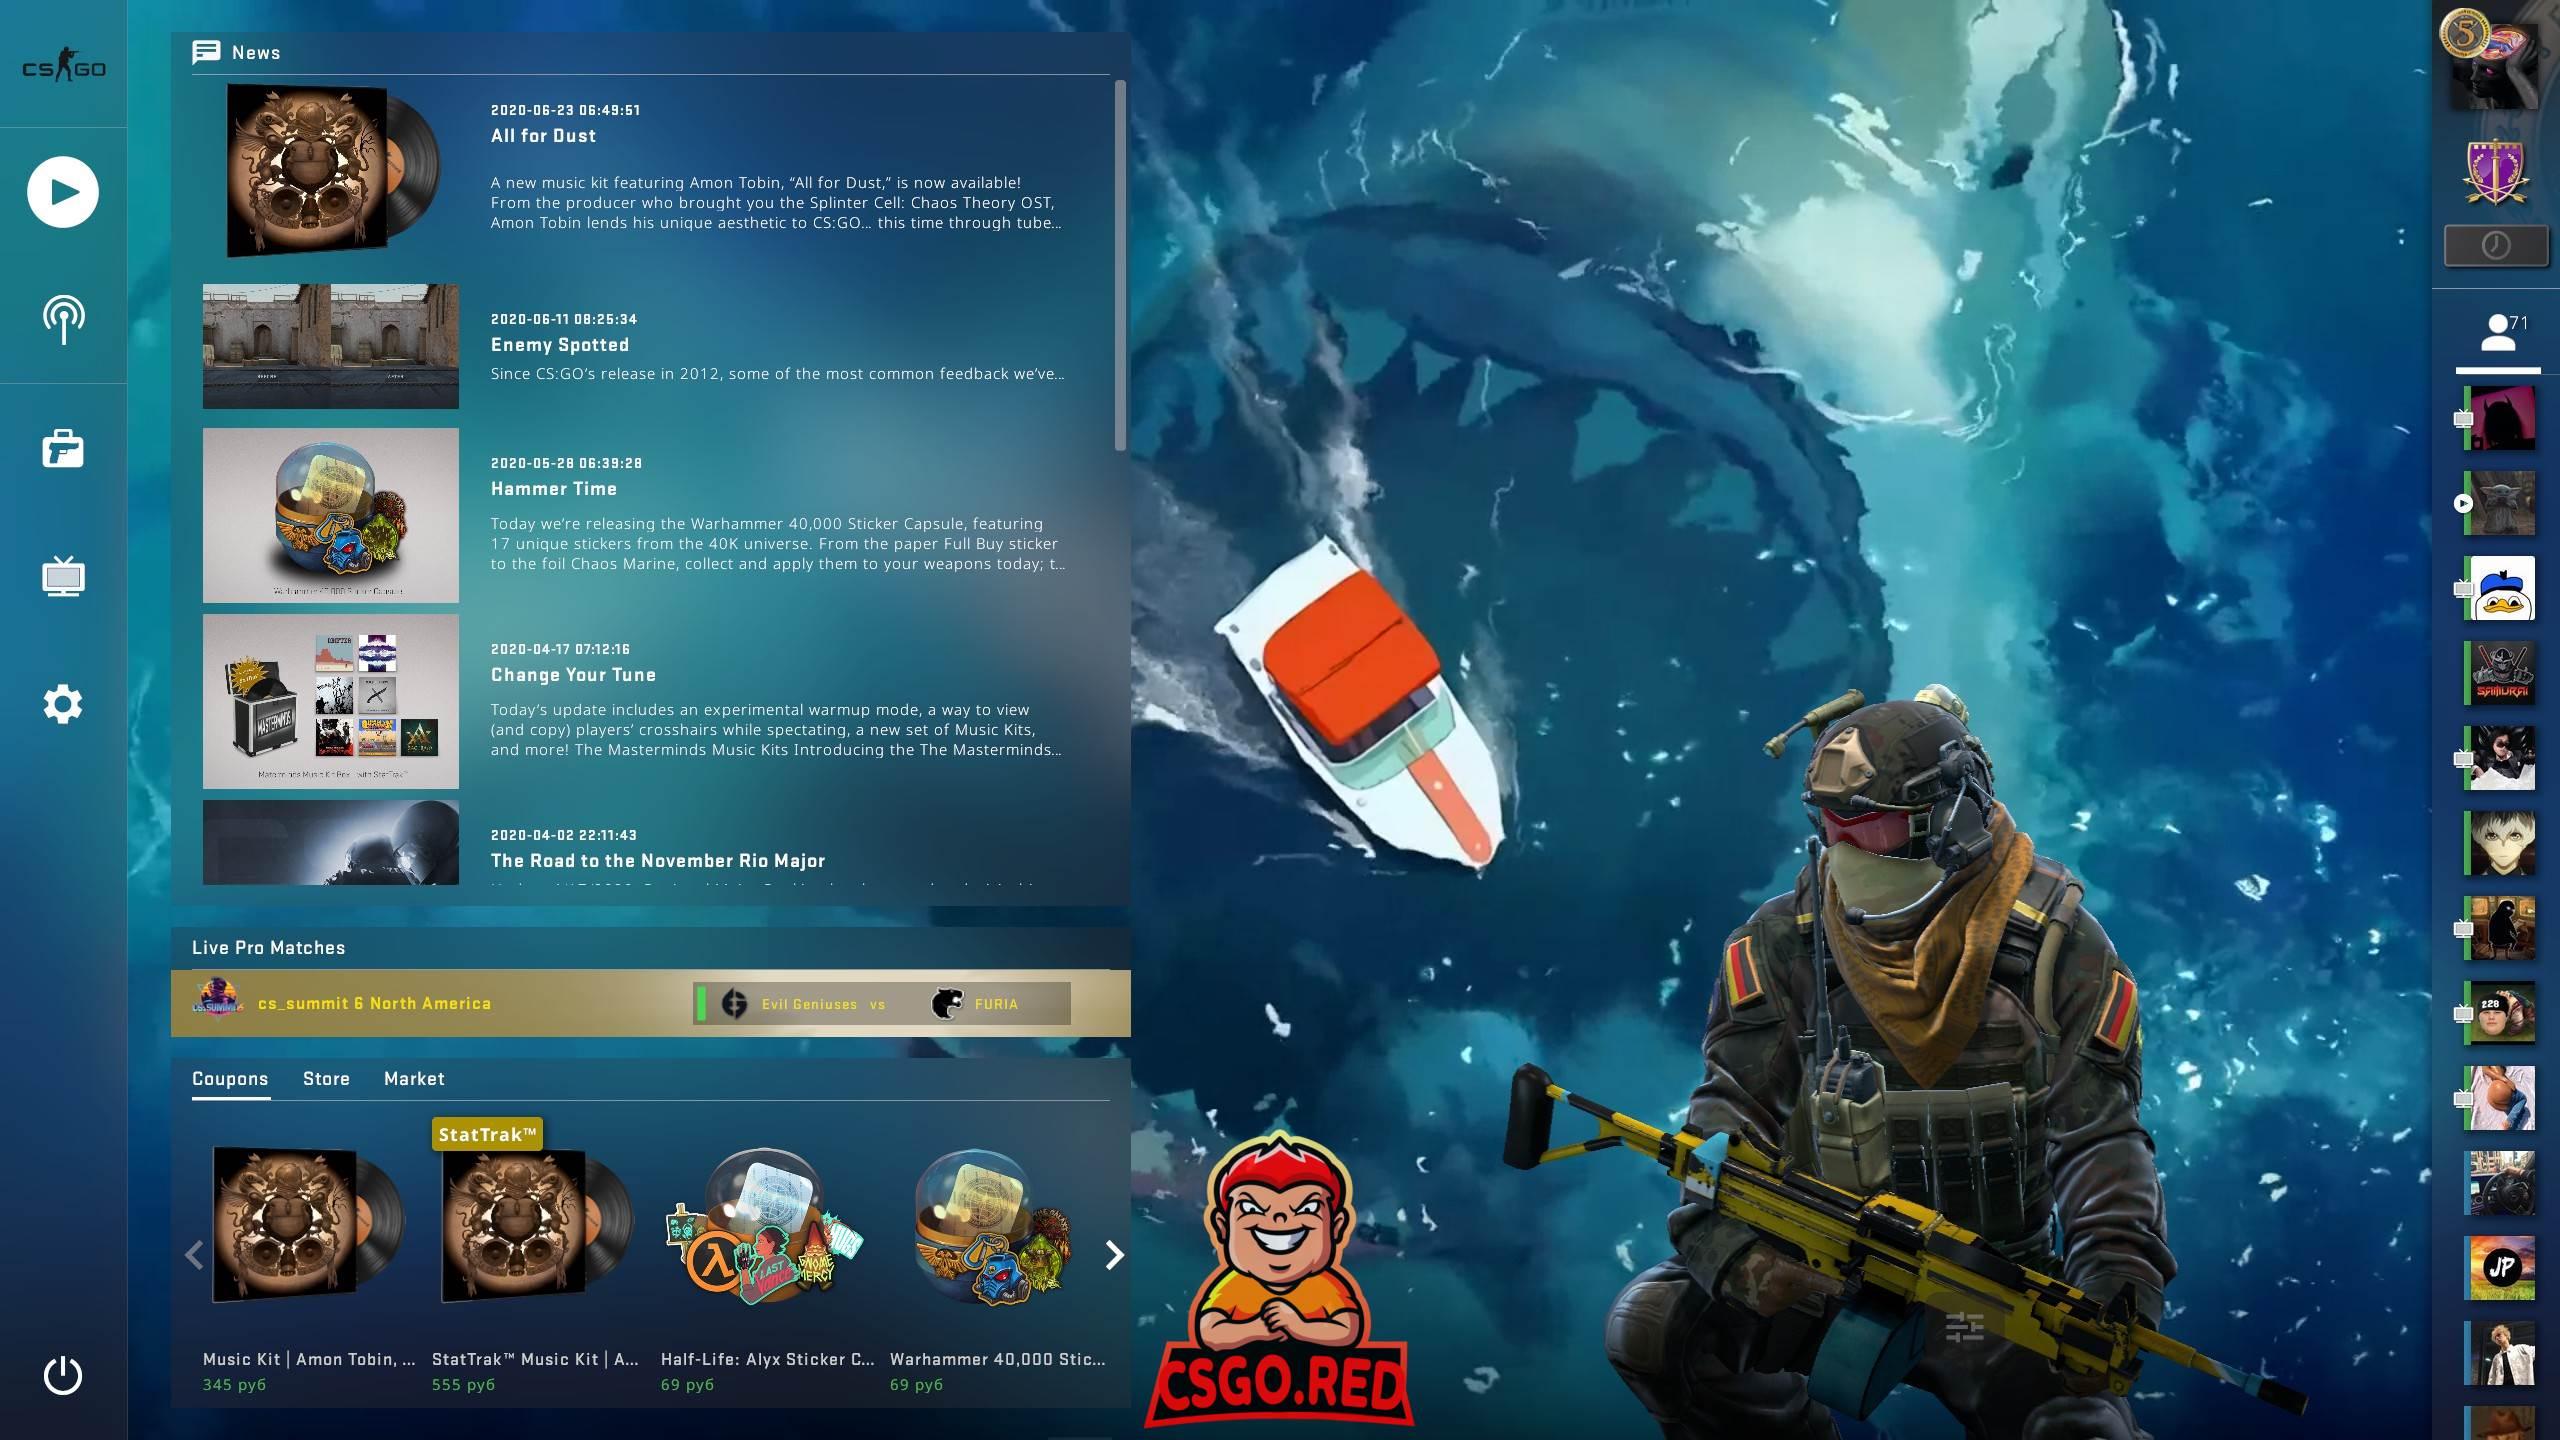 Shark Animated Panorama UI Background